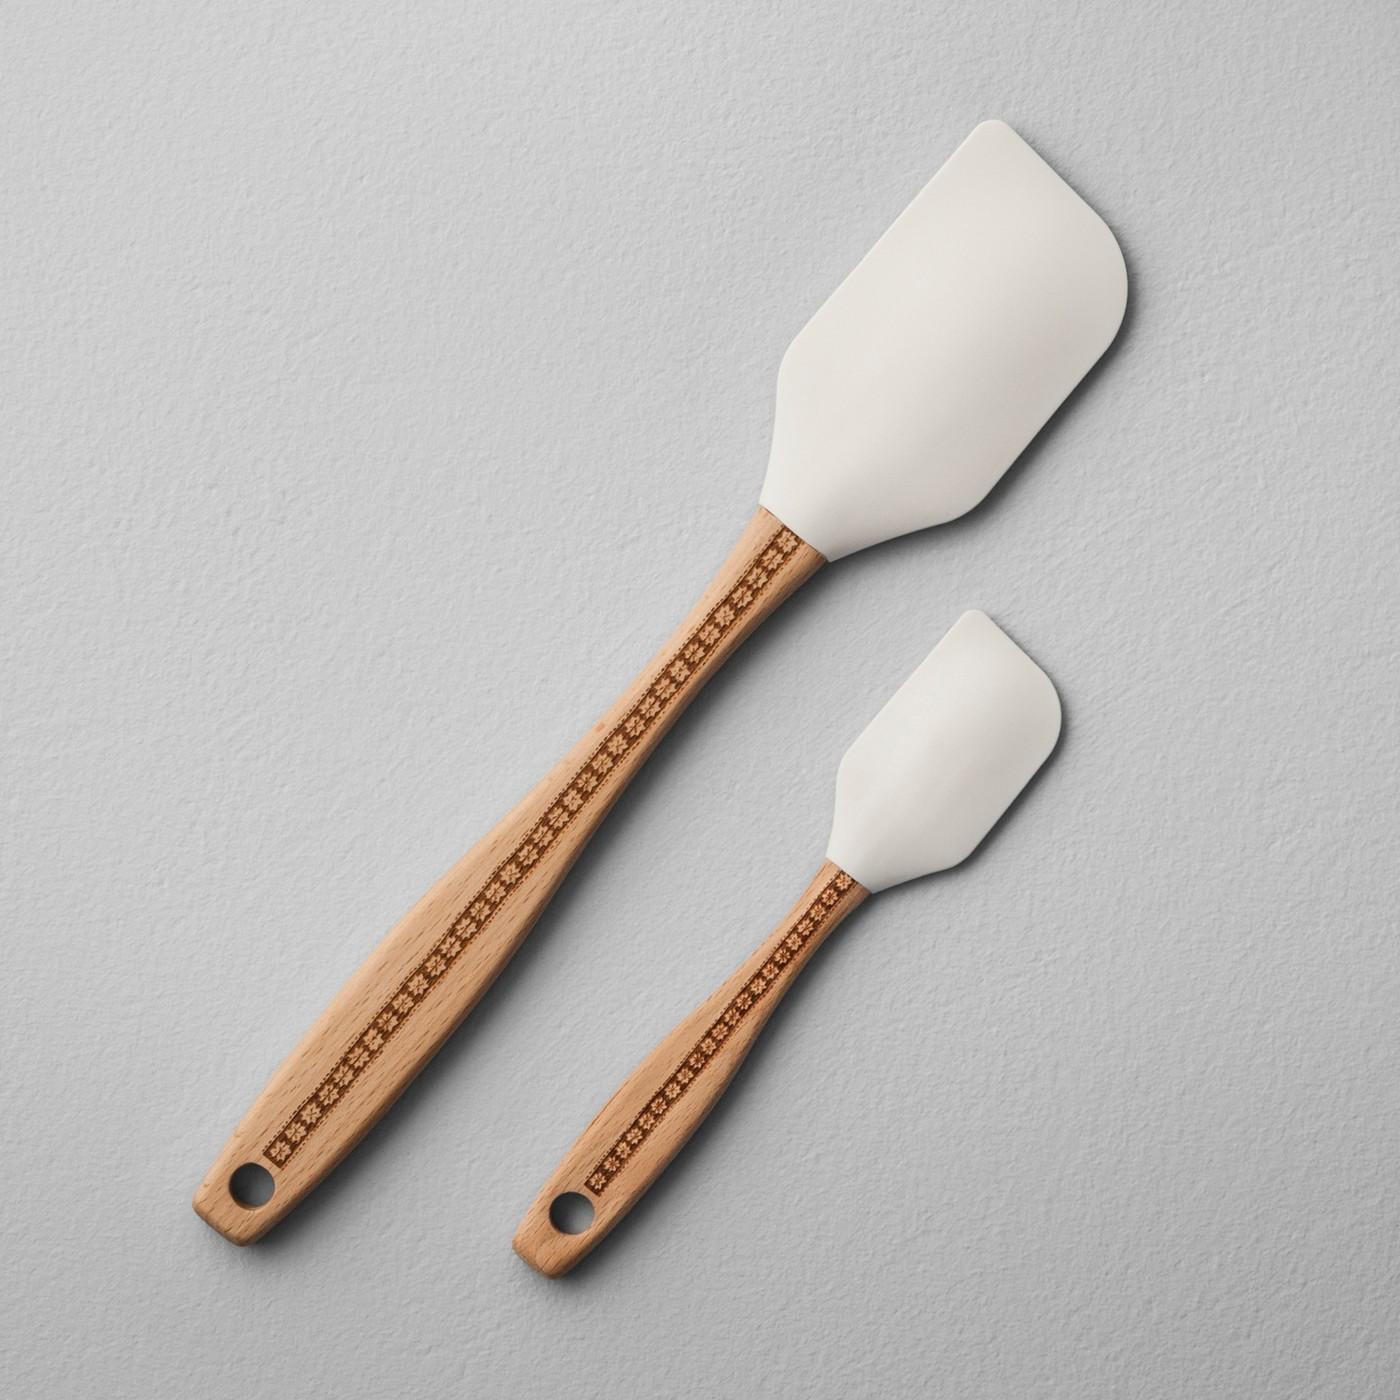 "Spatula Set of 2 - Snowflake Etch Handle - Hearth & Handâ""¢ with Magnolia - image 1 of 2"